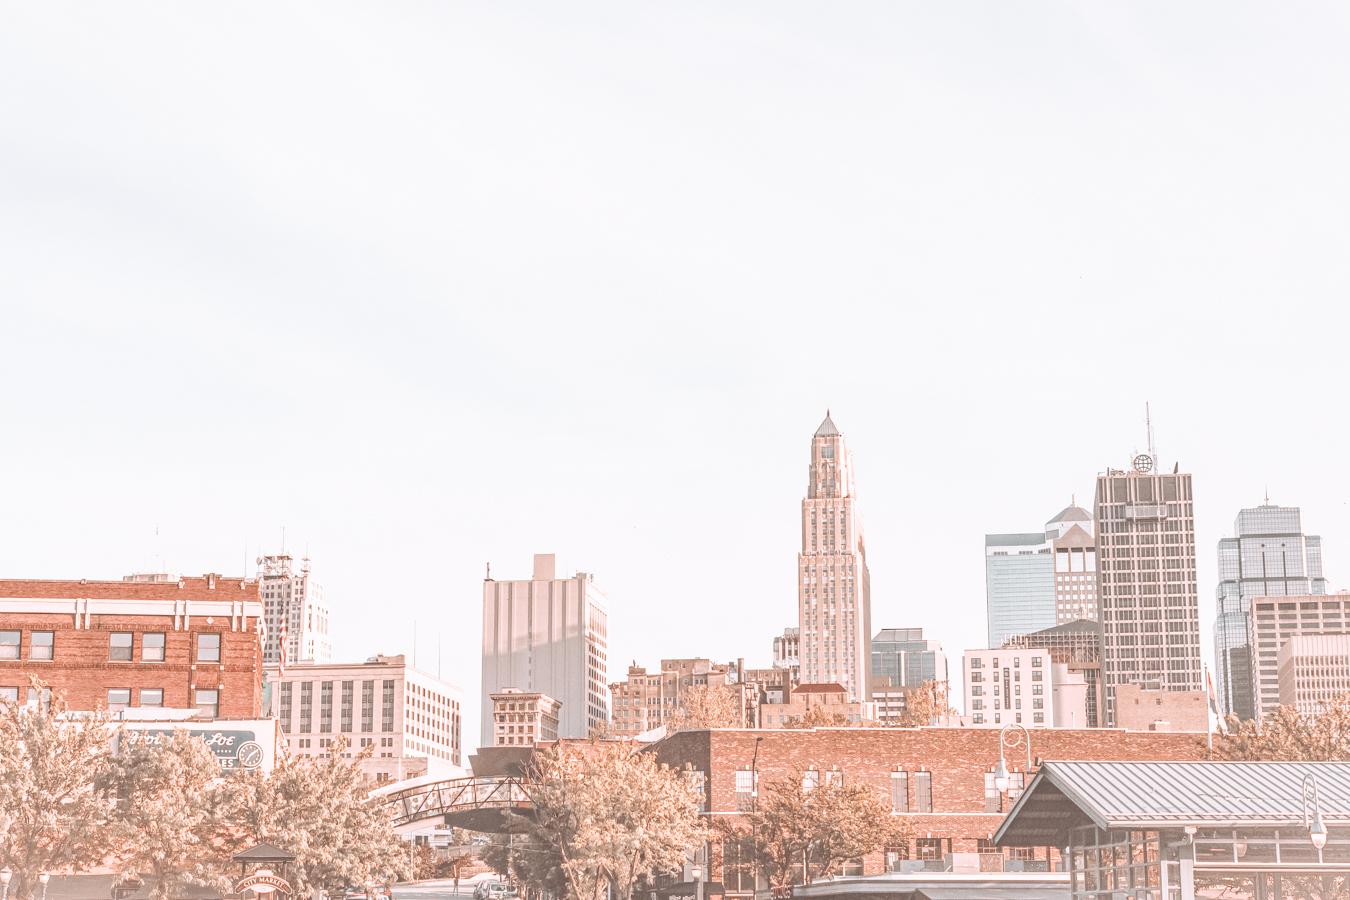 Buildings in Kansas City